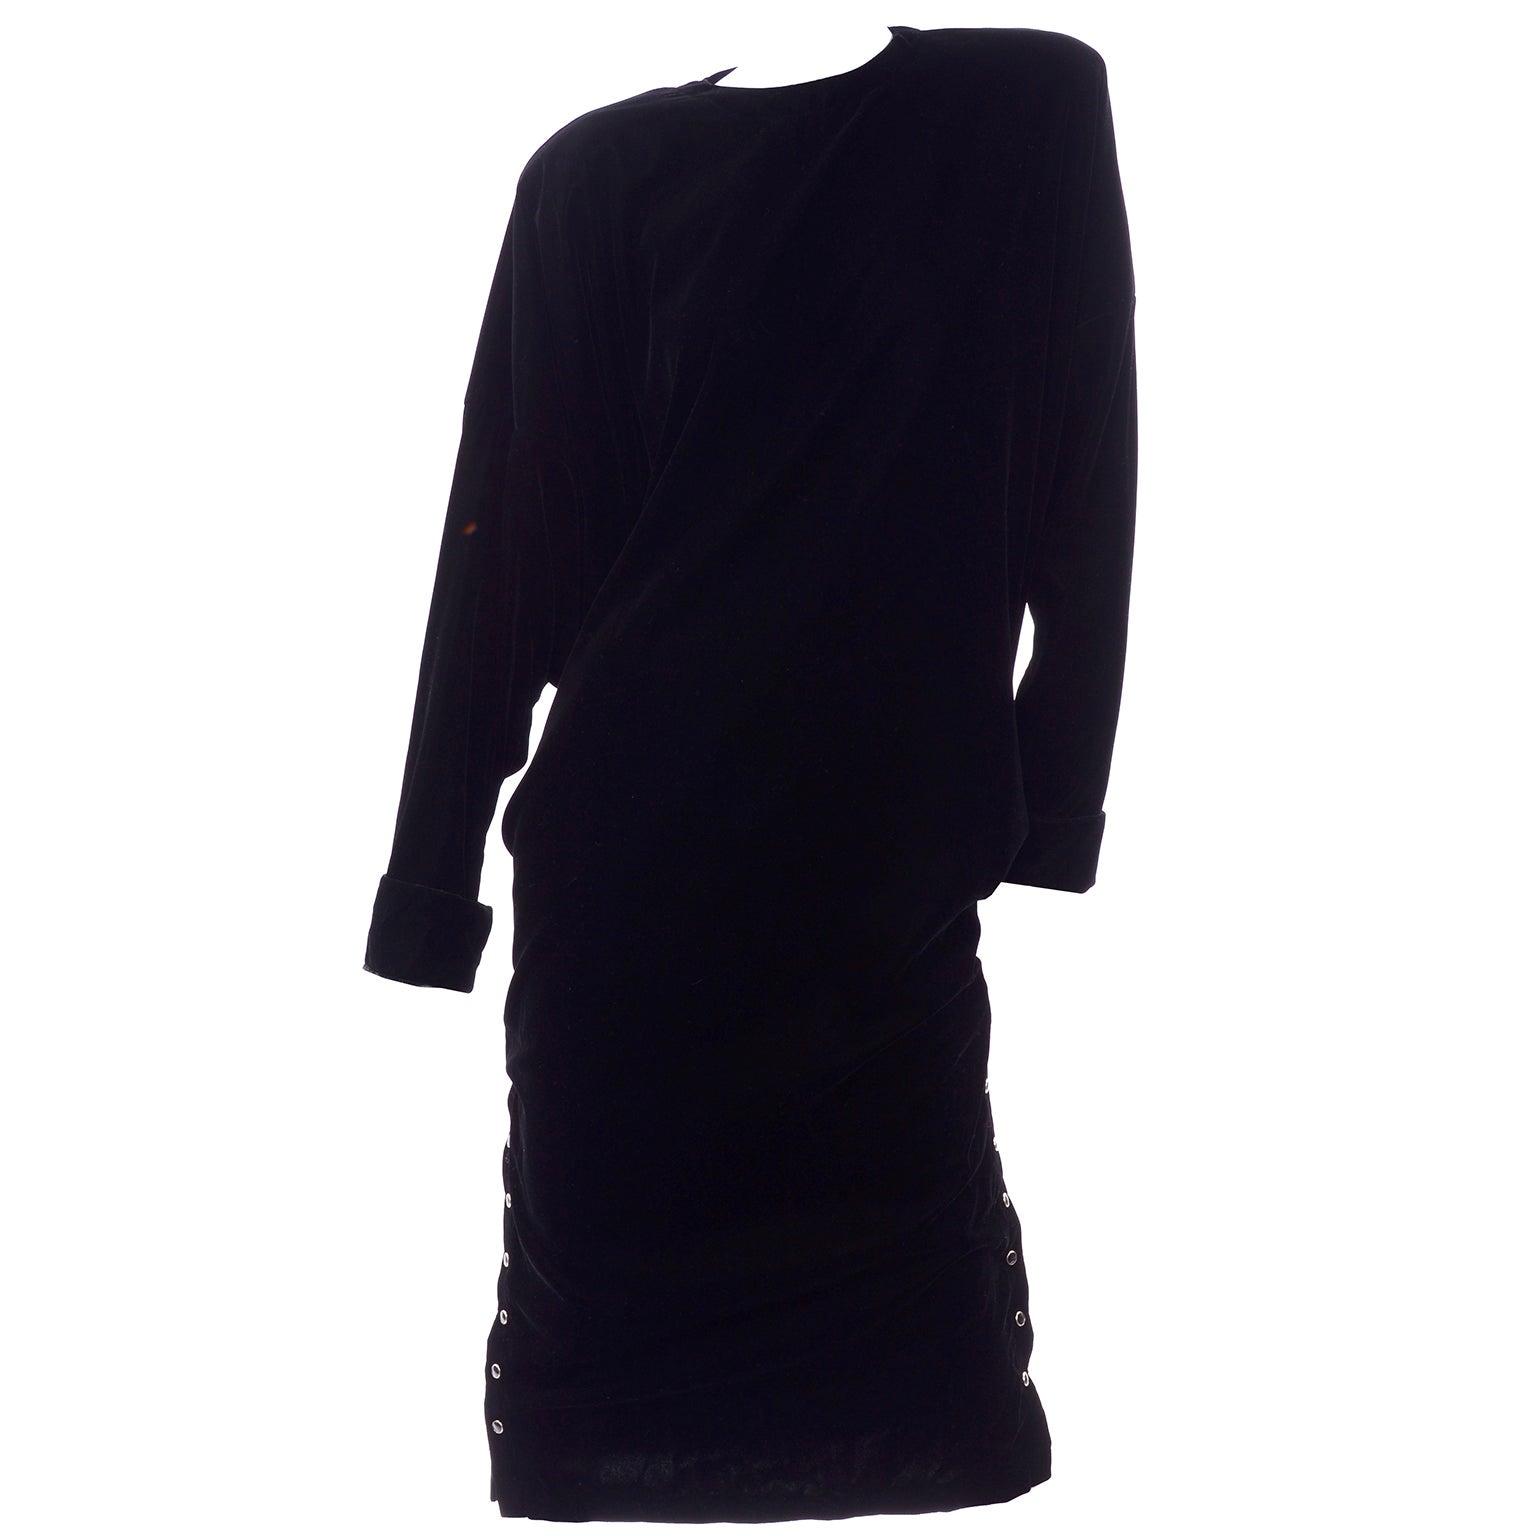 Norma Kamali 1980s Black Velvet Vintage Oversized  Dress With Snaps on Side